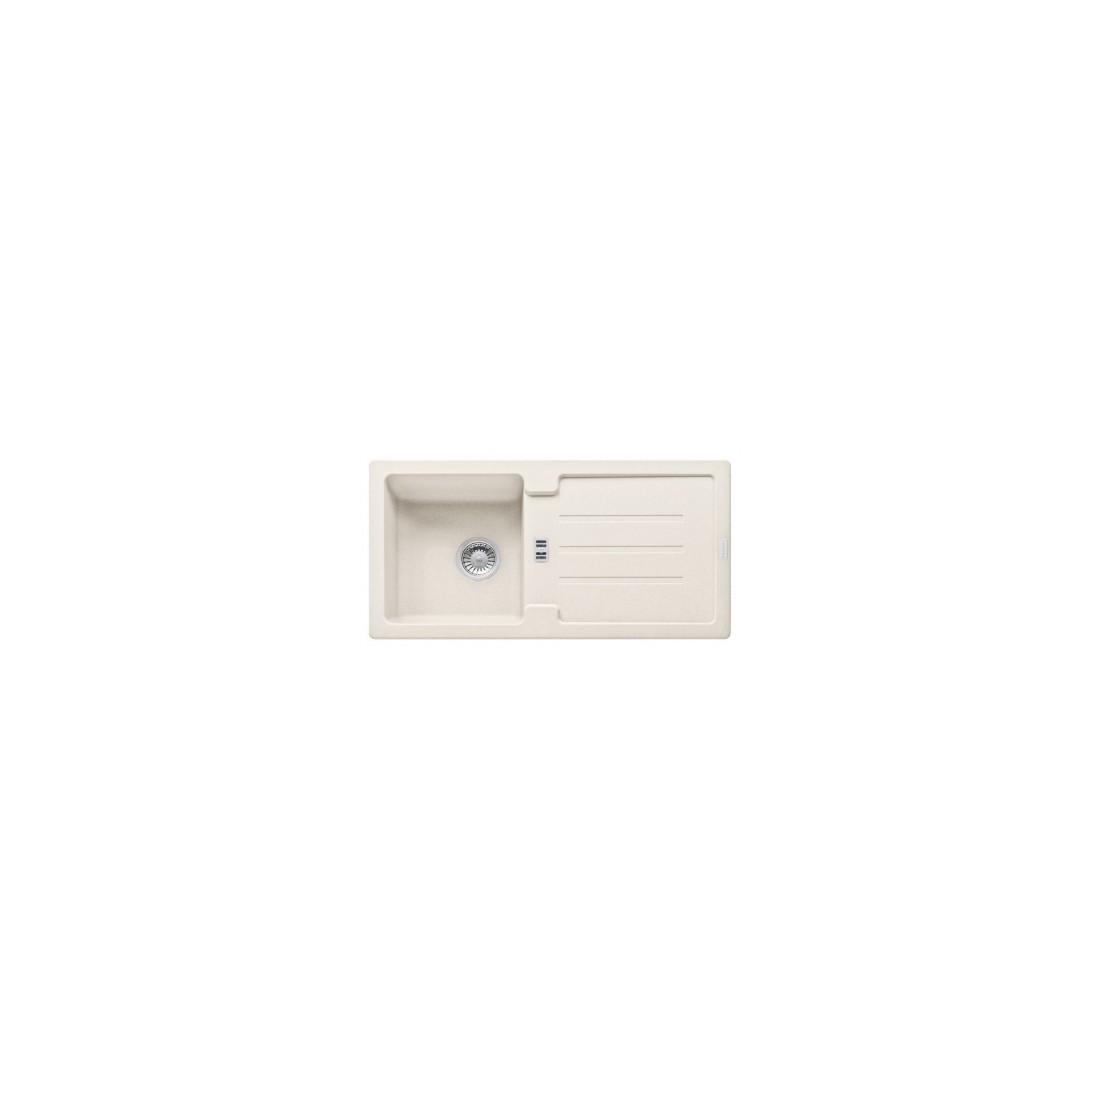 Akmens masės plautuvė Franke Strata, STG 614-86, Magnolia, ekscentrinis ventilis